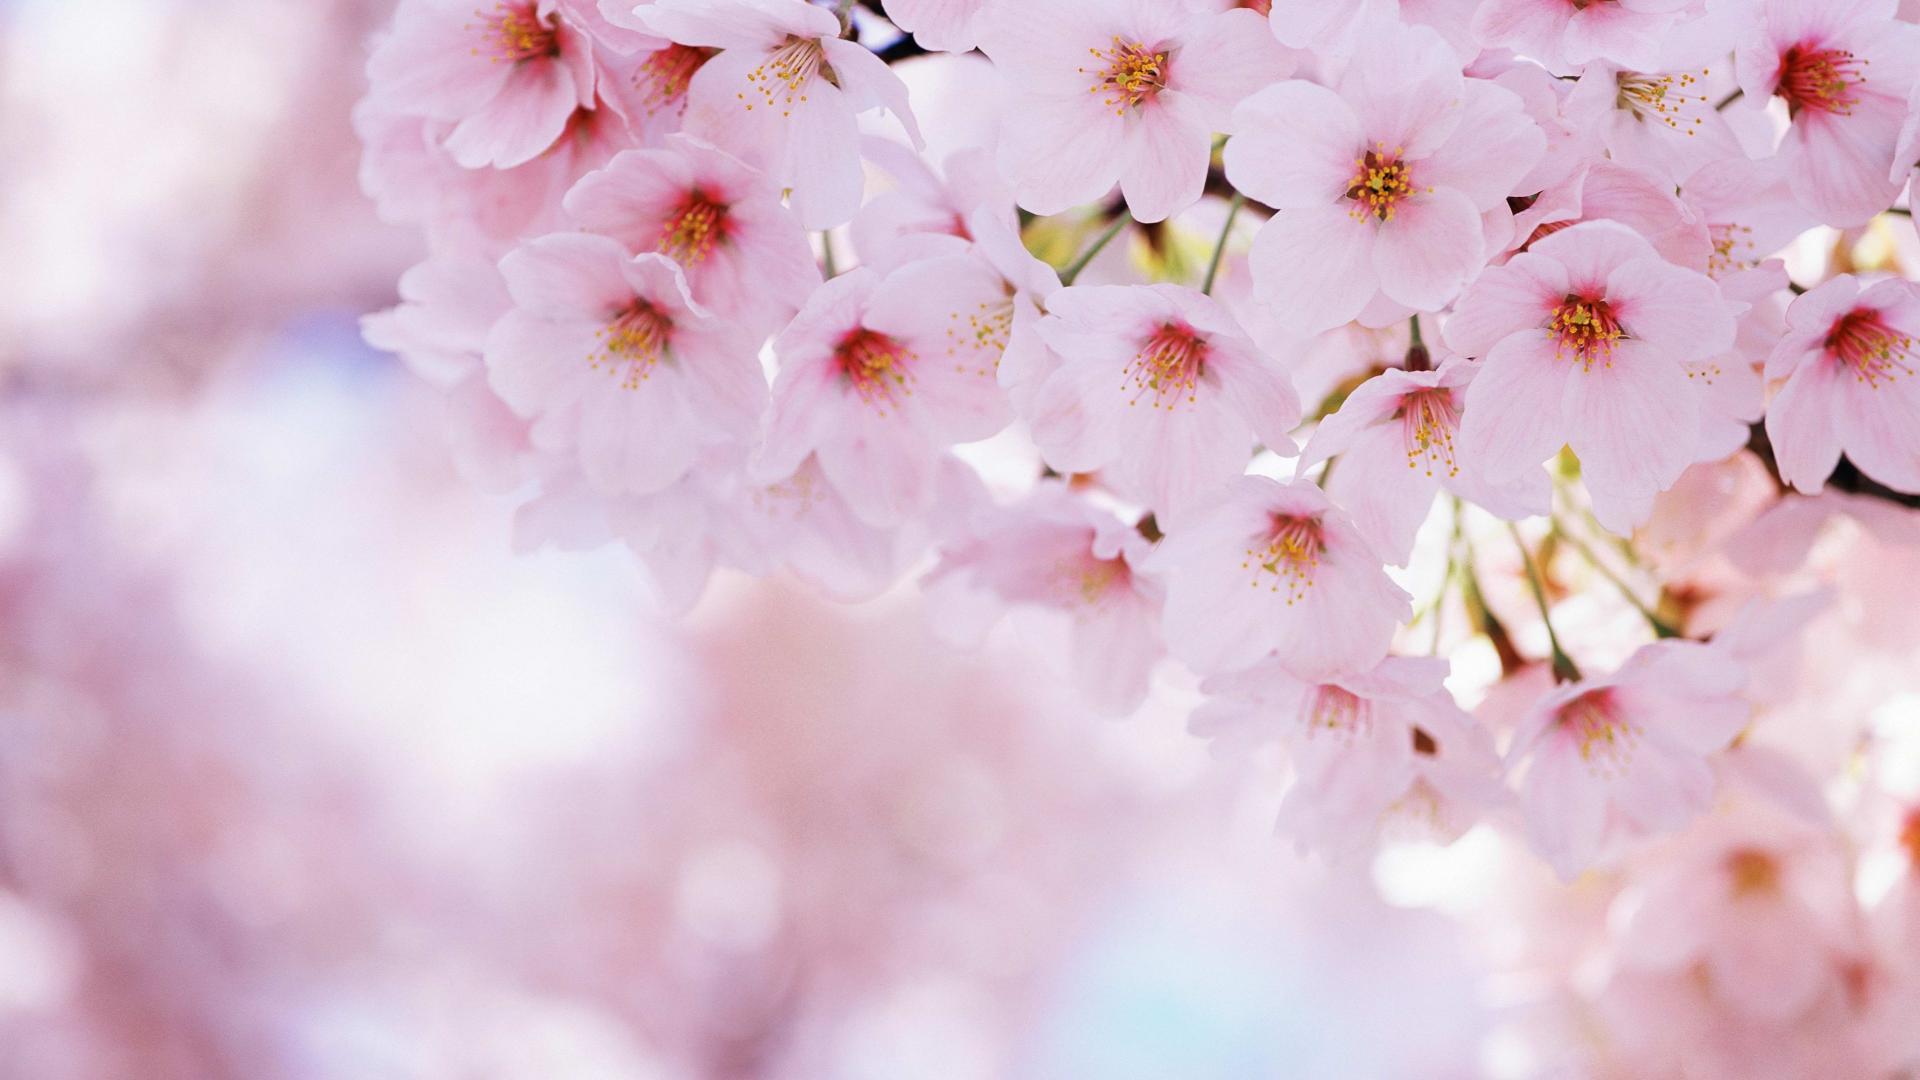 Sakura Flower Cherry Bloom Petals Spring Hi Wallpaper With 1920×1080